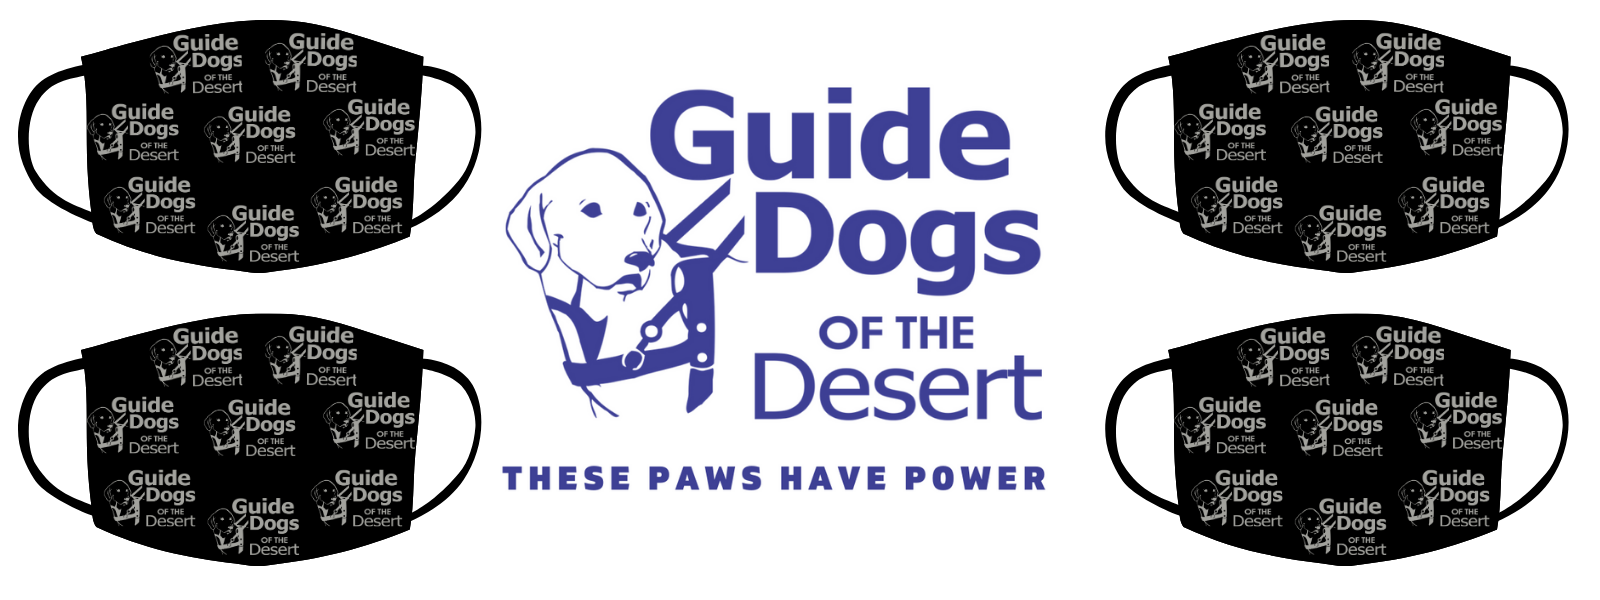 Guide Dogs of the Desert Masks  image